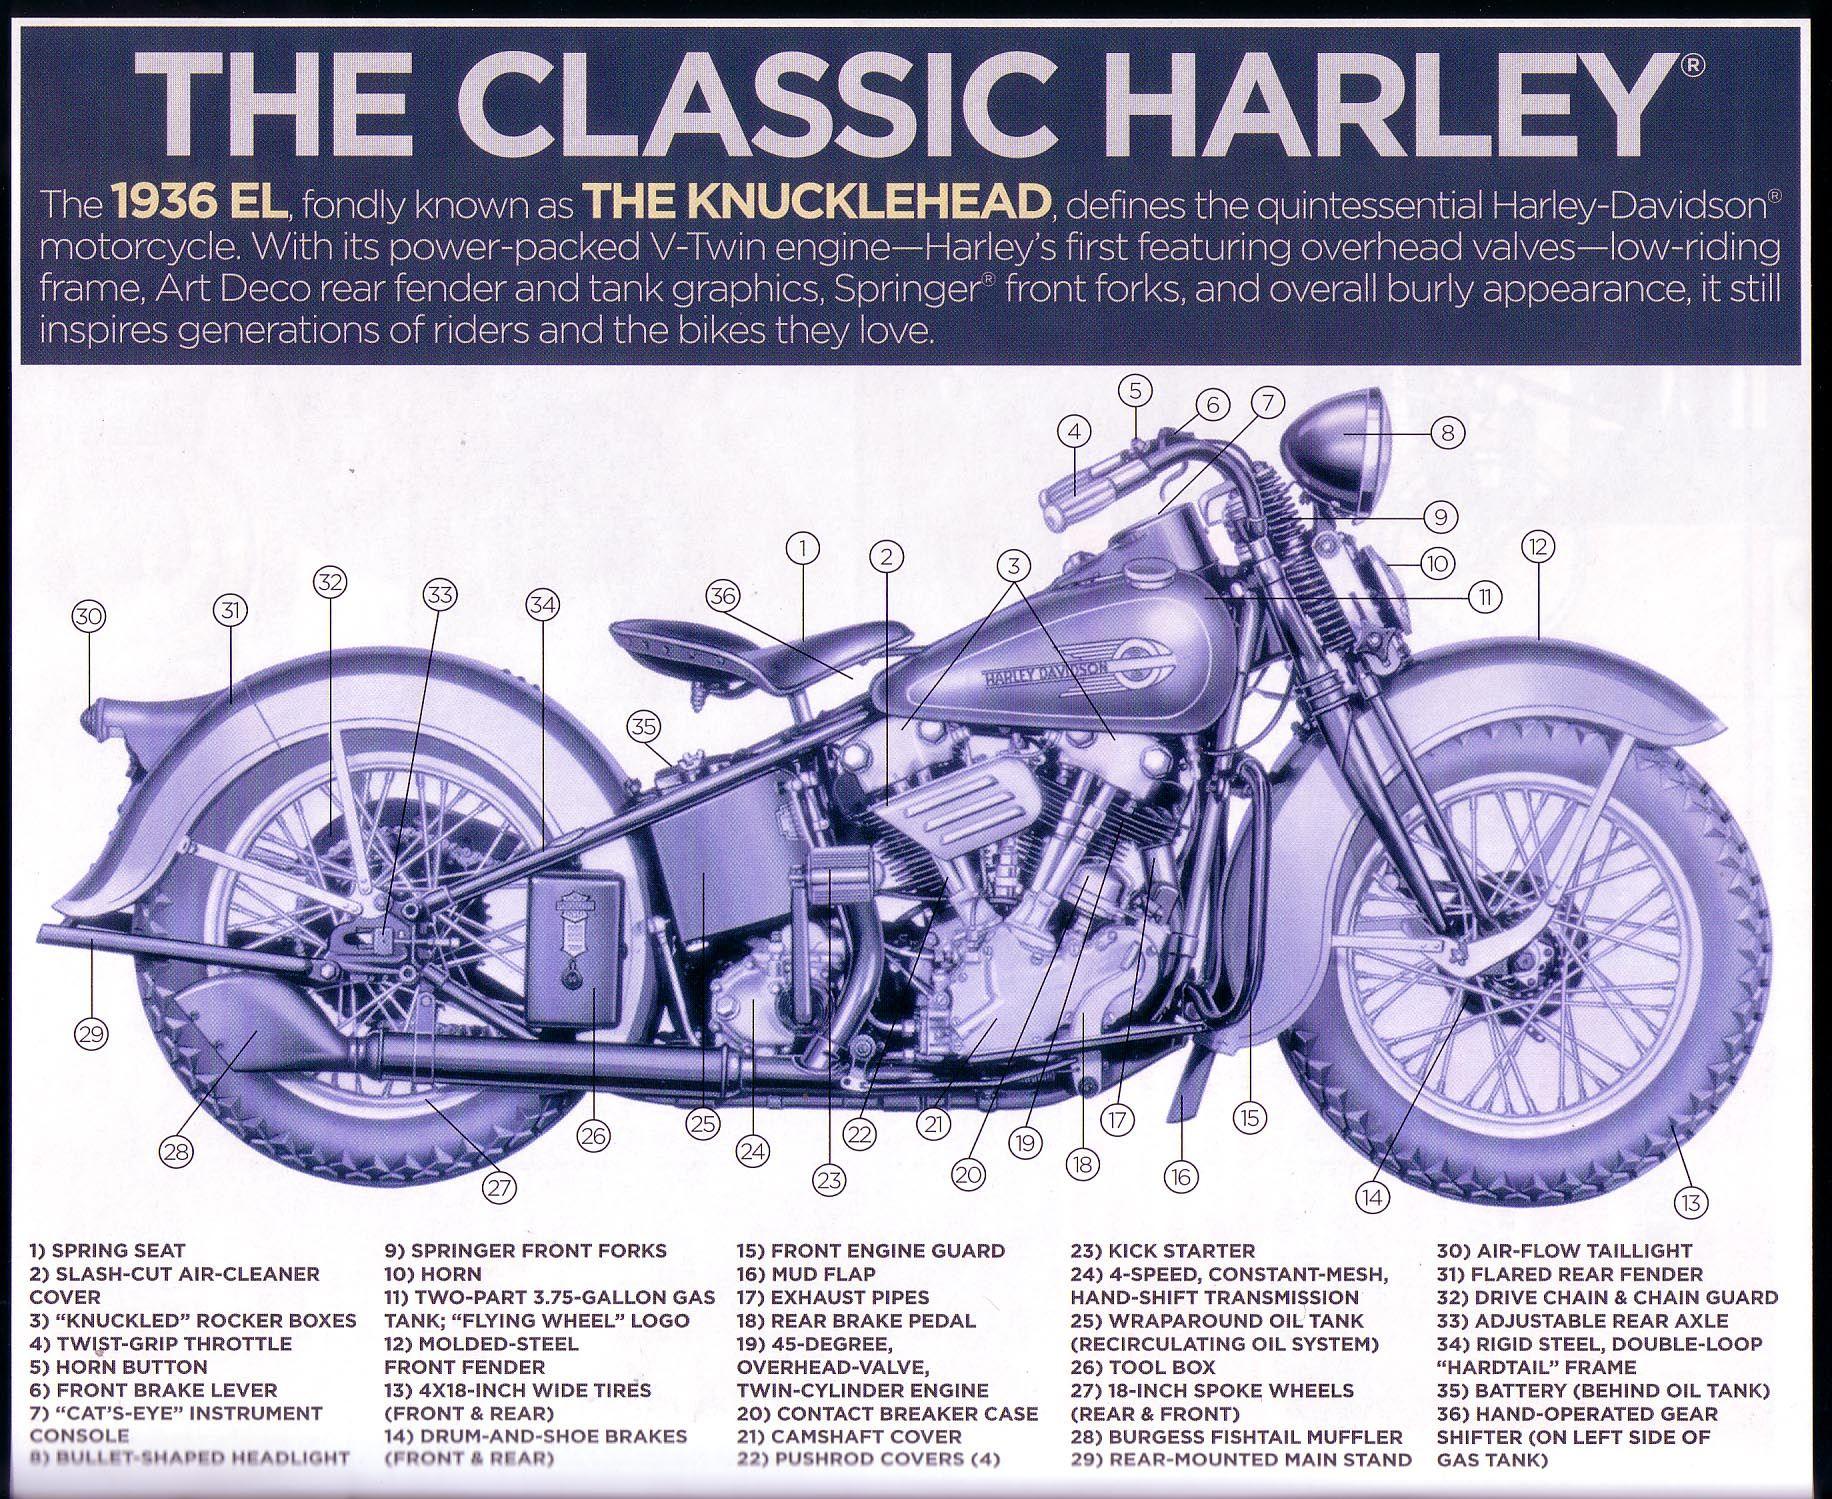 medium resolution of harley davidson motorcycle diagrams wiring diagram expert harley davidson motorcycle parts diagram harley davidson motorcycle diagrams